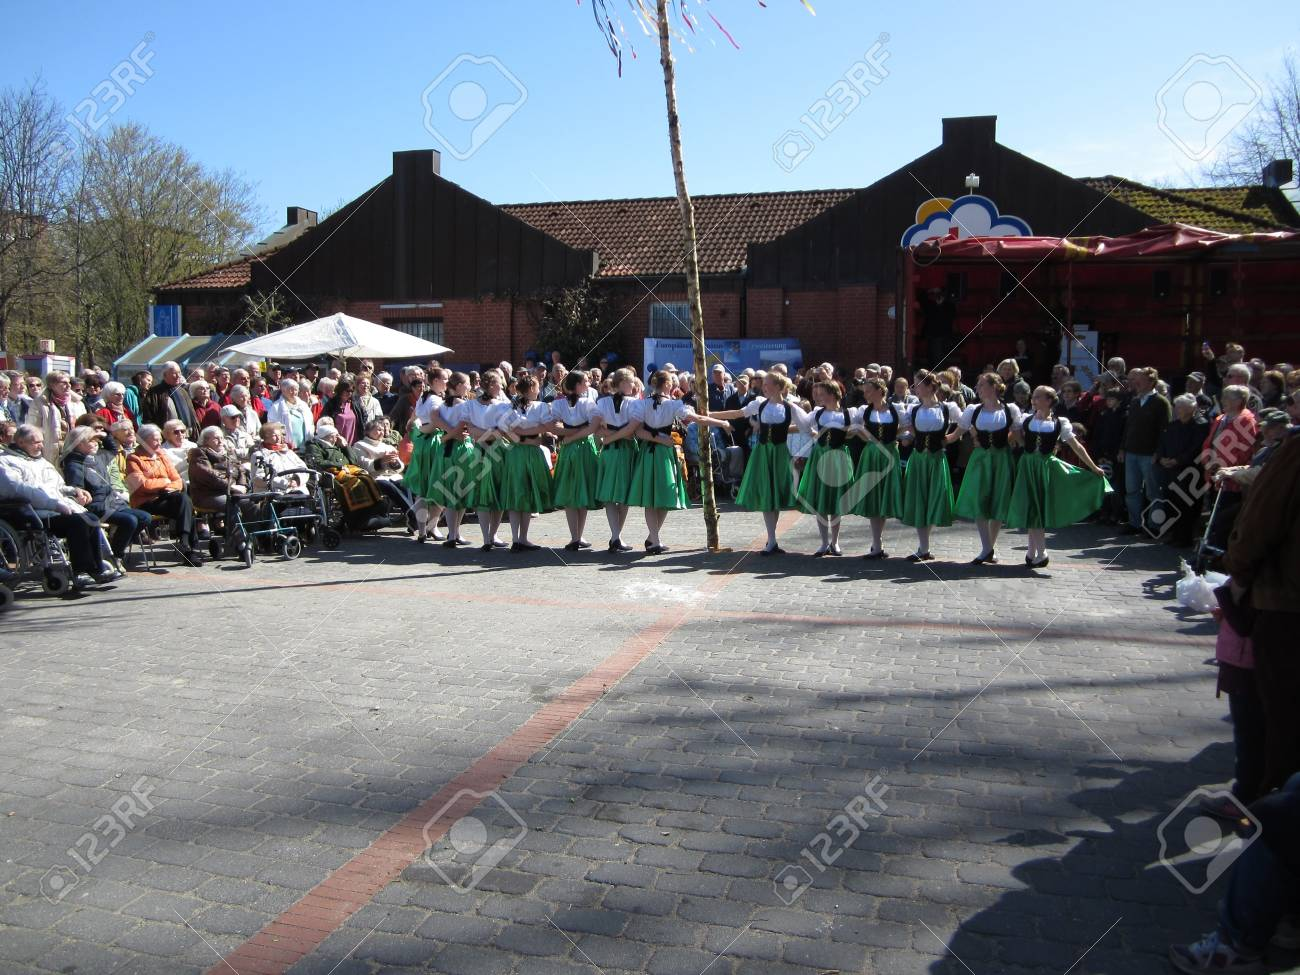 Dancing around the maypole Stock Photo - 20132895